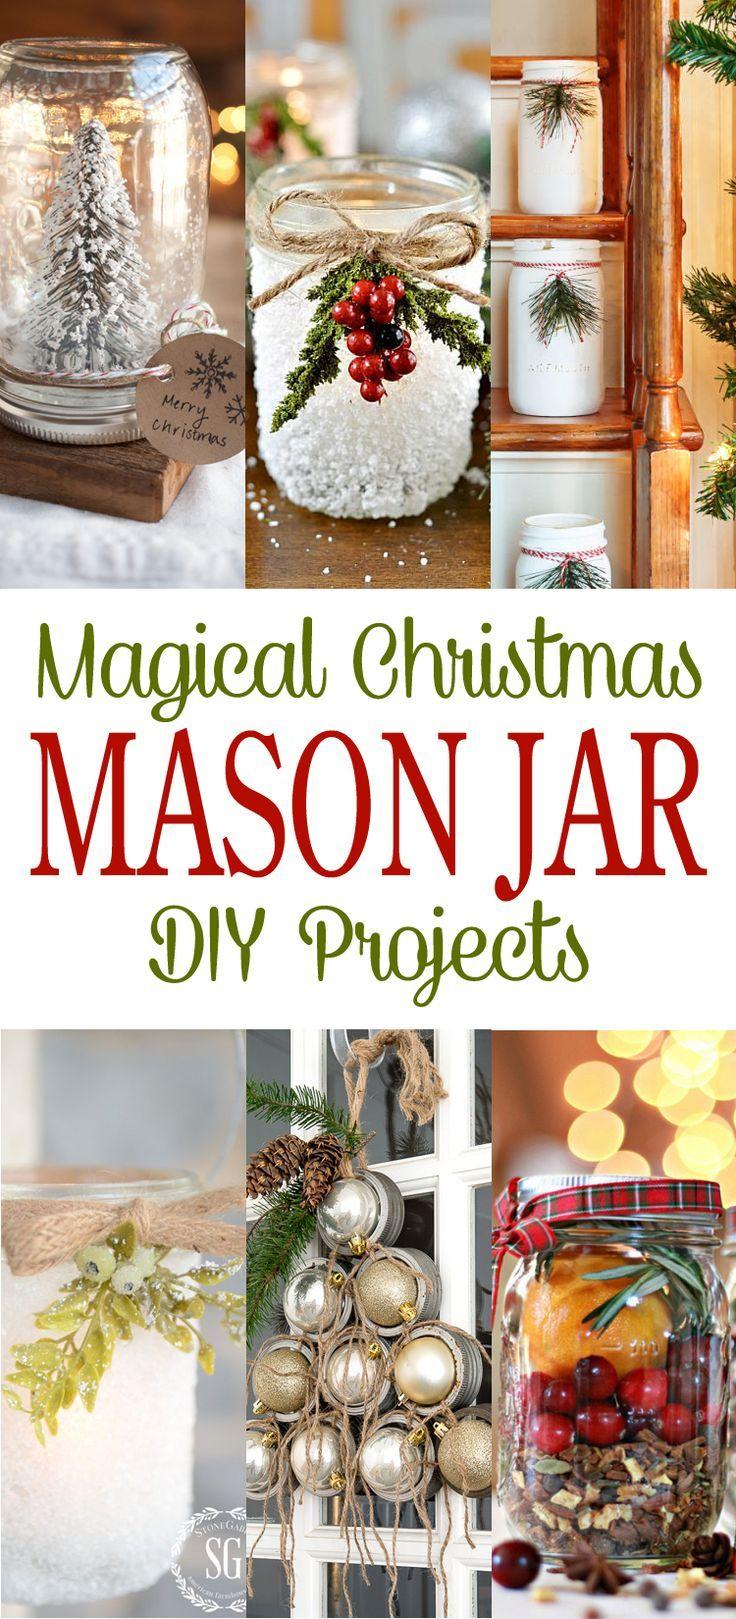 Mason Jar Decorating Ideas For Christmas Magical Christmas Mason Jar Diy Projects